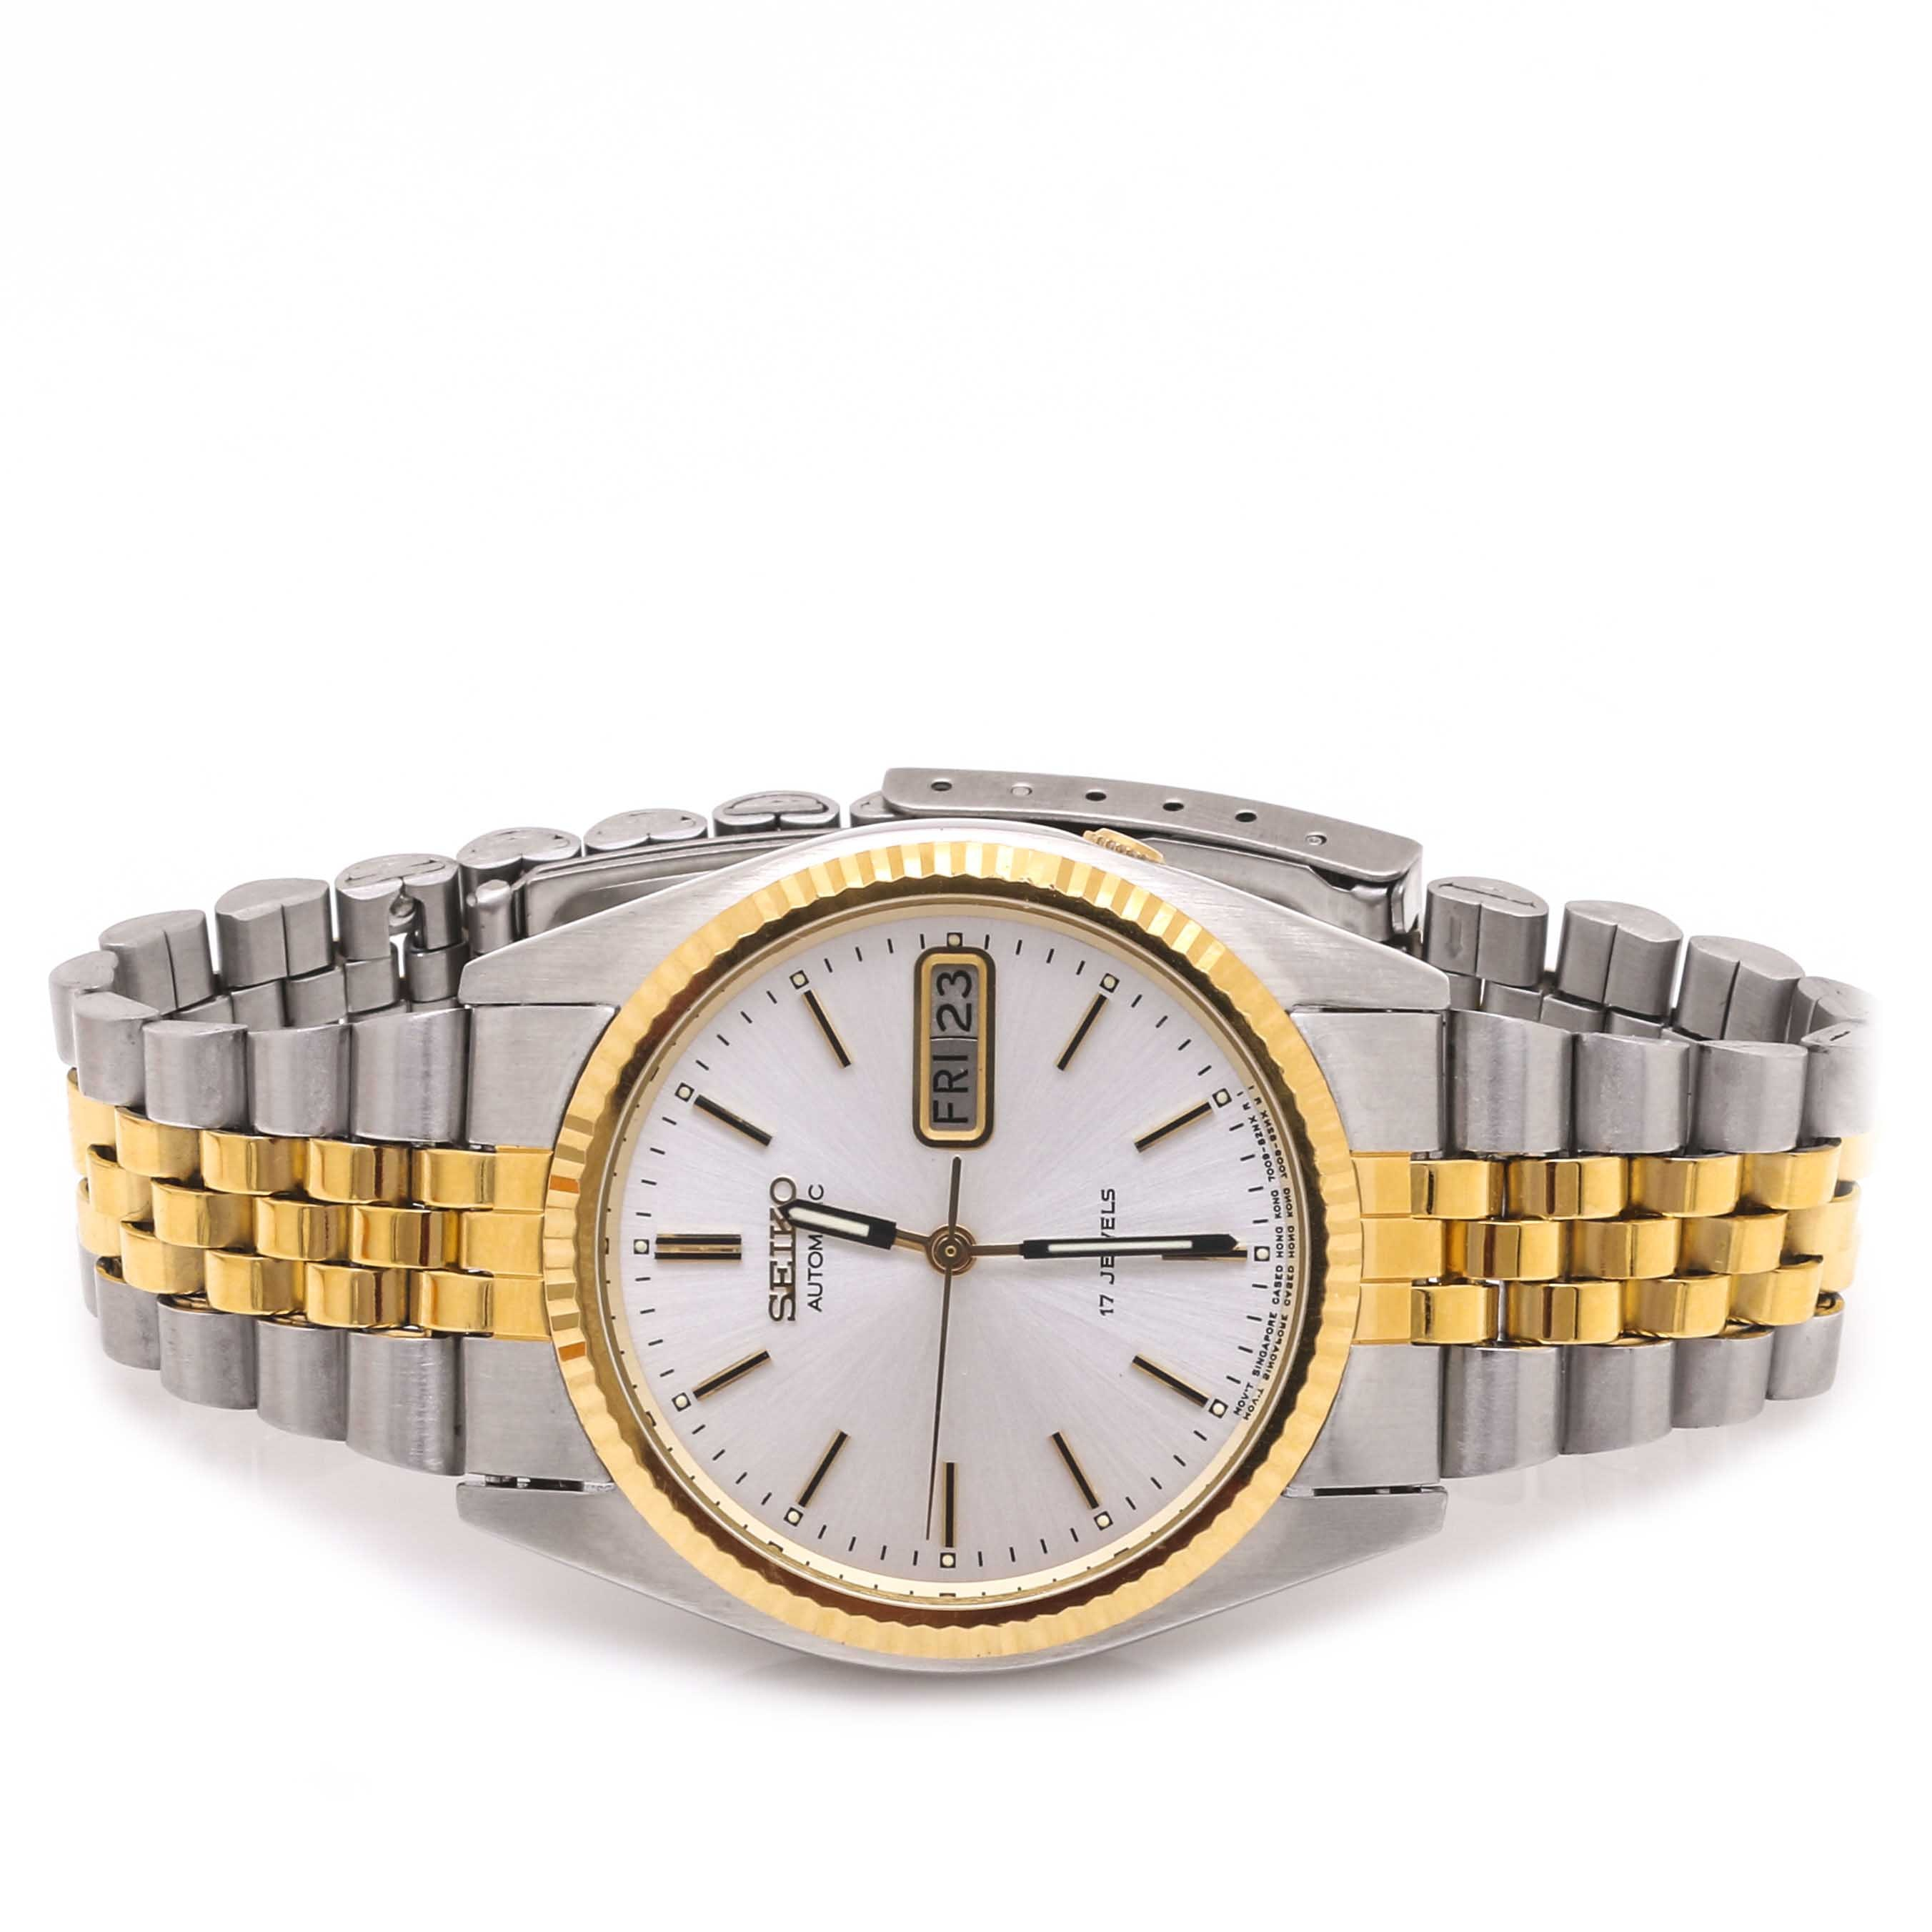 Seiko Silver and Gold Tone Wristwatch